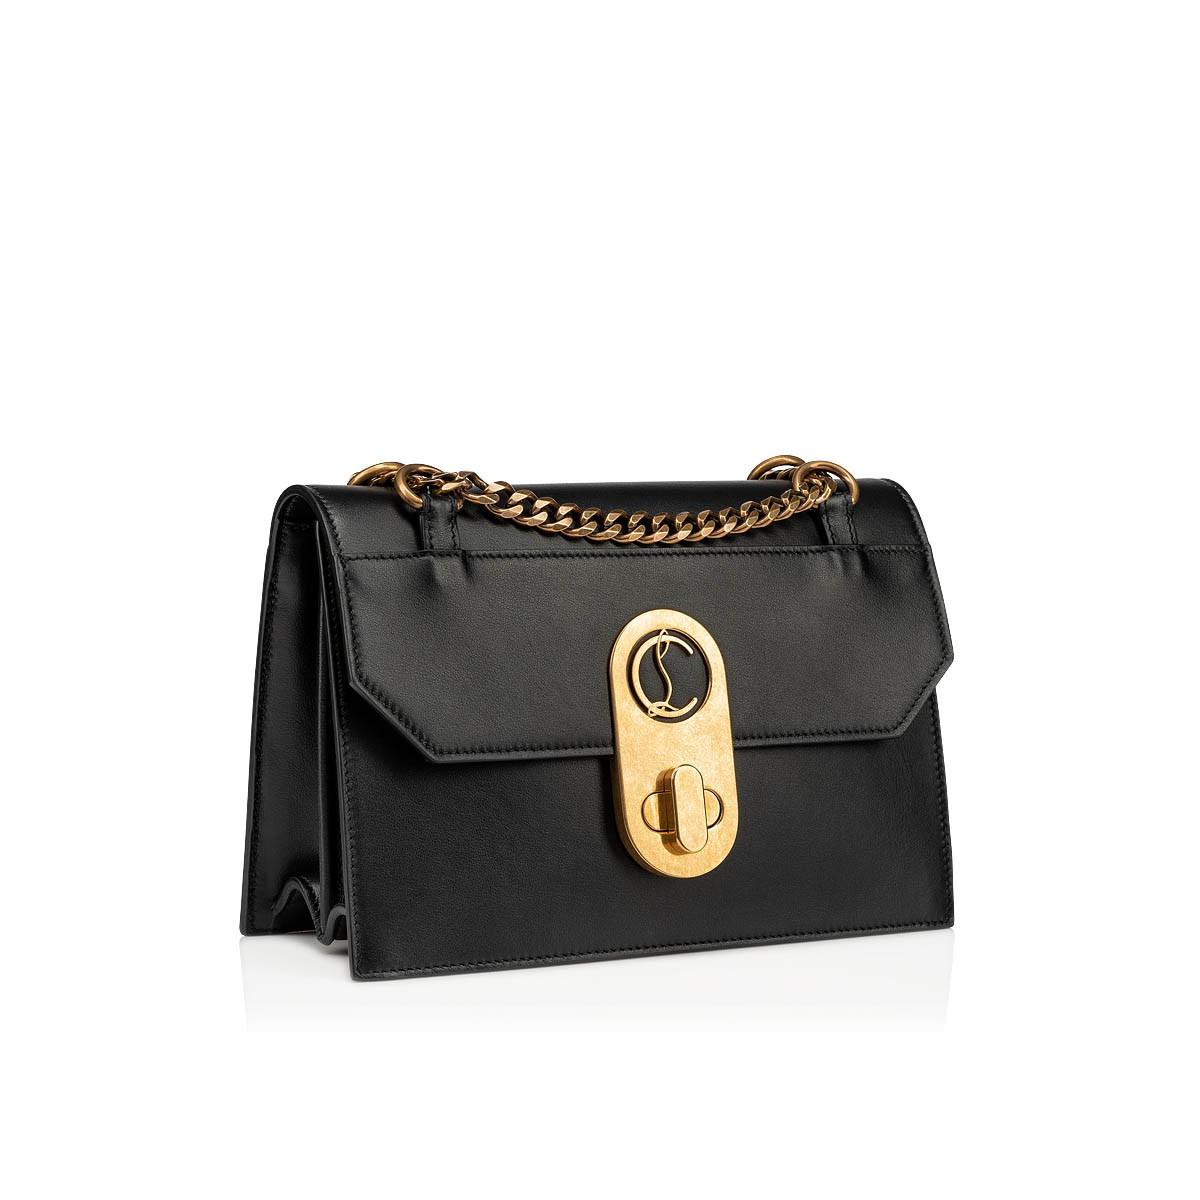 Women Bags - Elisa - Christian Louboutin